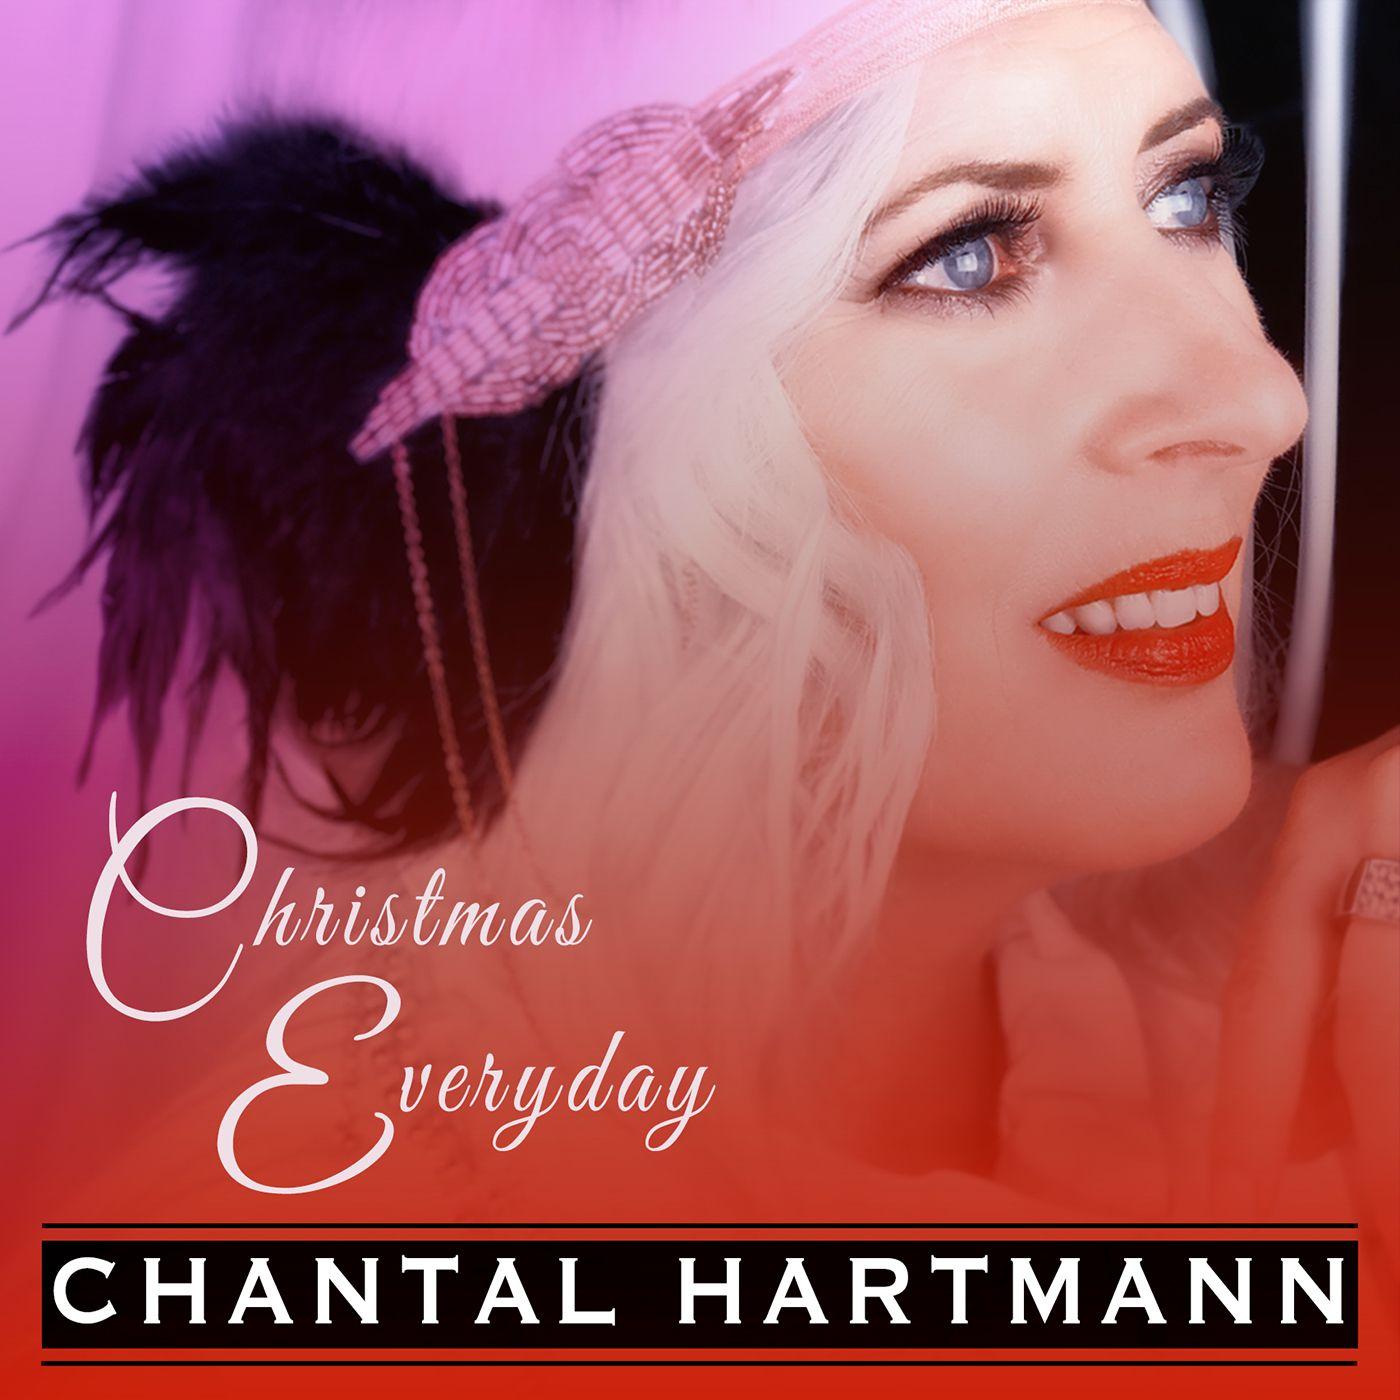 Chantal Hartmann